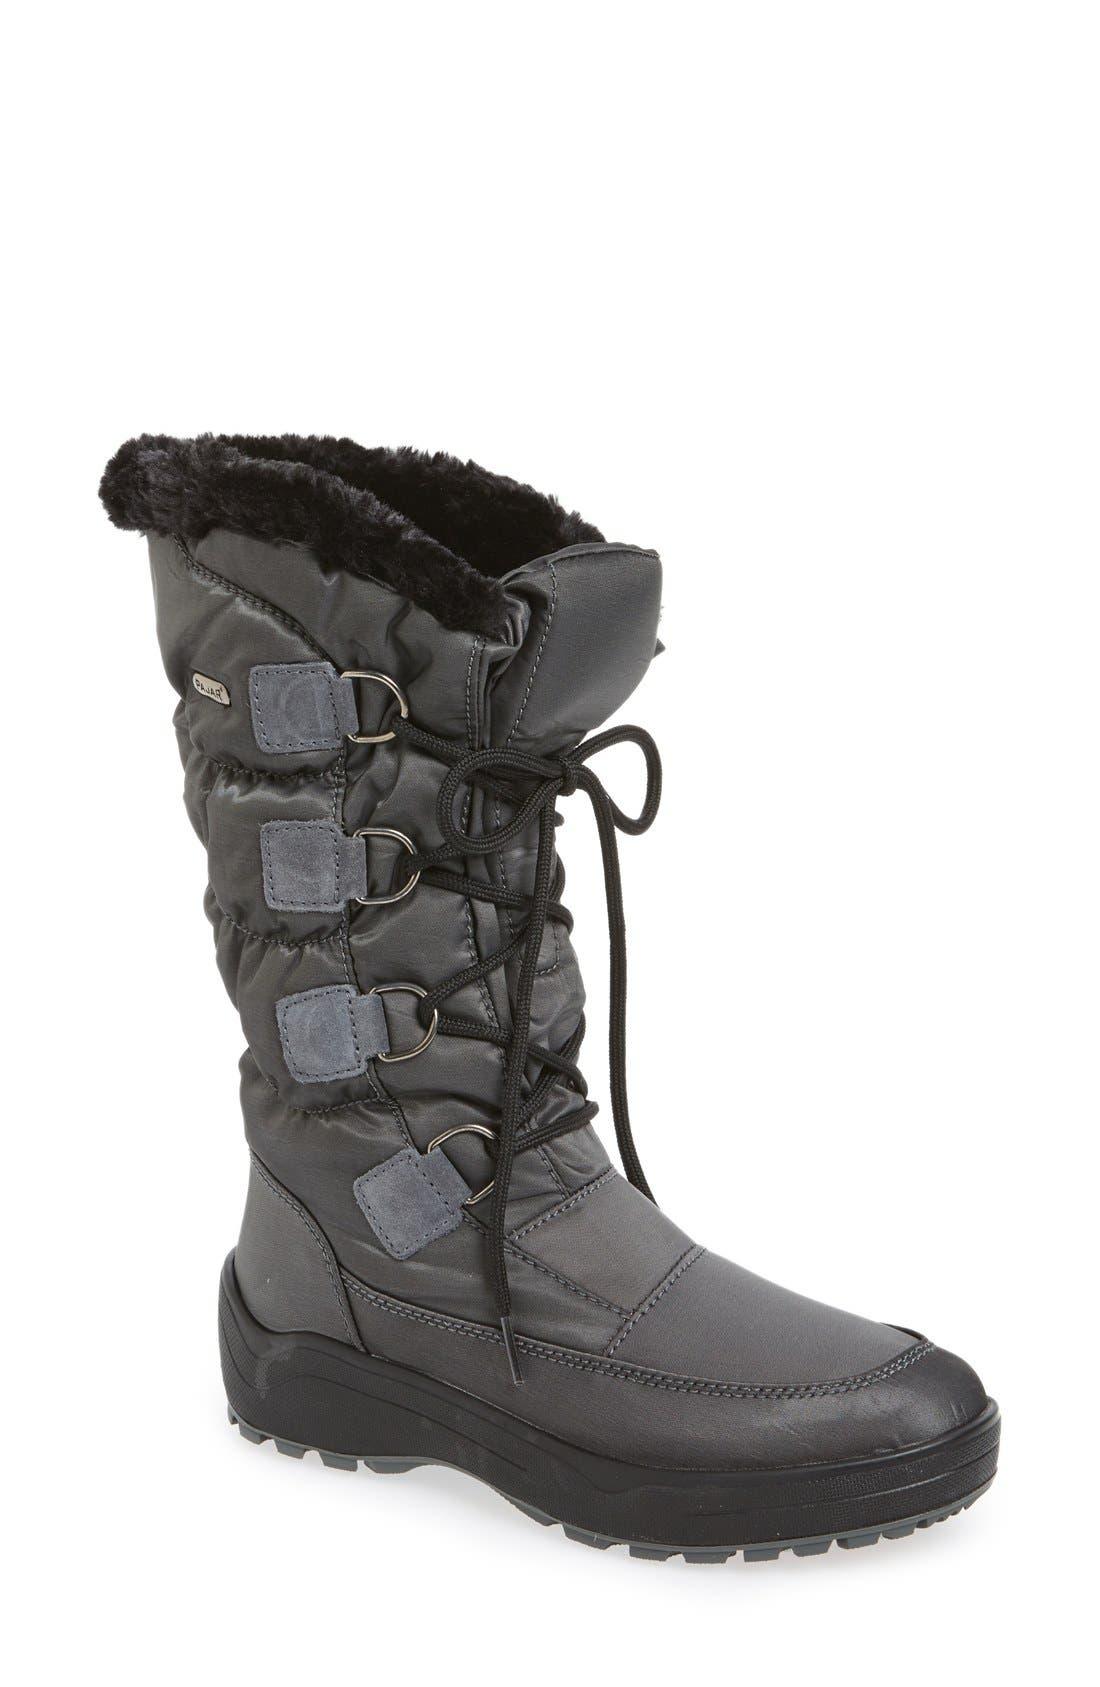 Main Image - Pajar 'Riga' Waterproof Ice Grippers® Boot (Women)